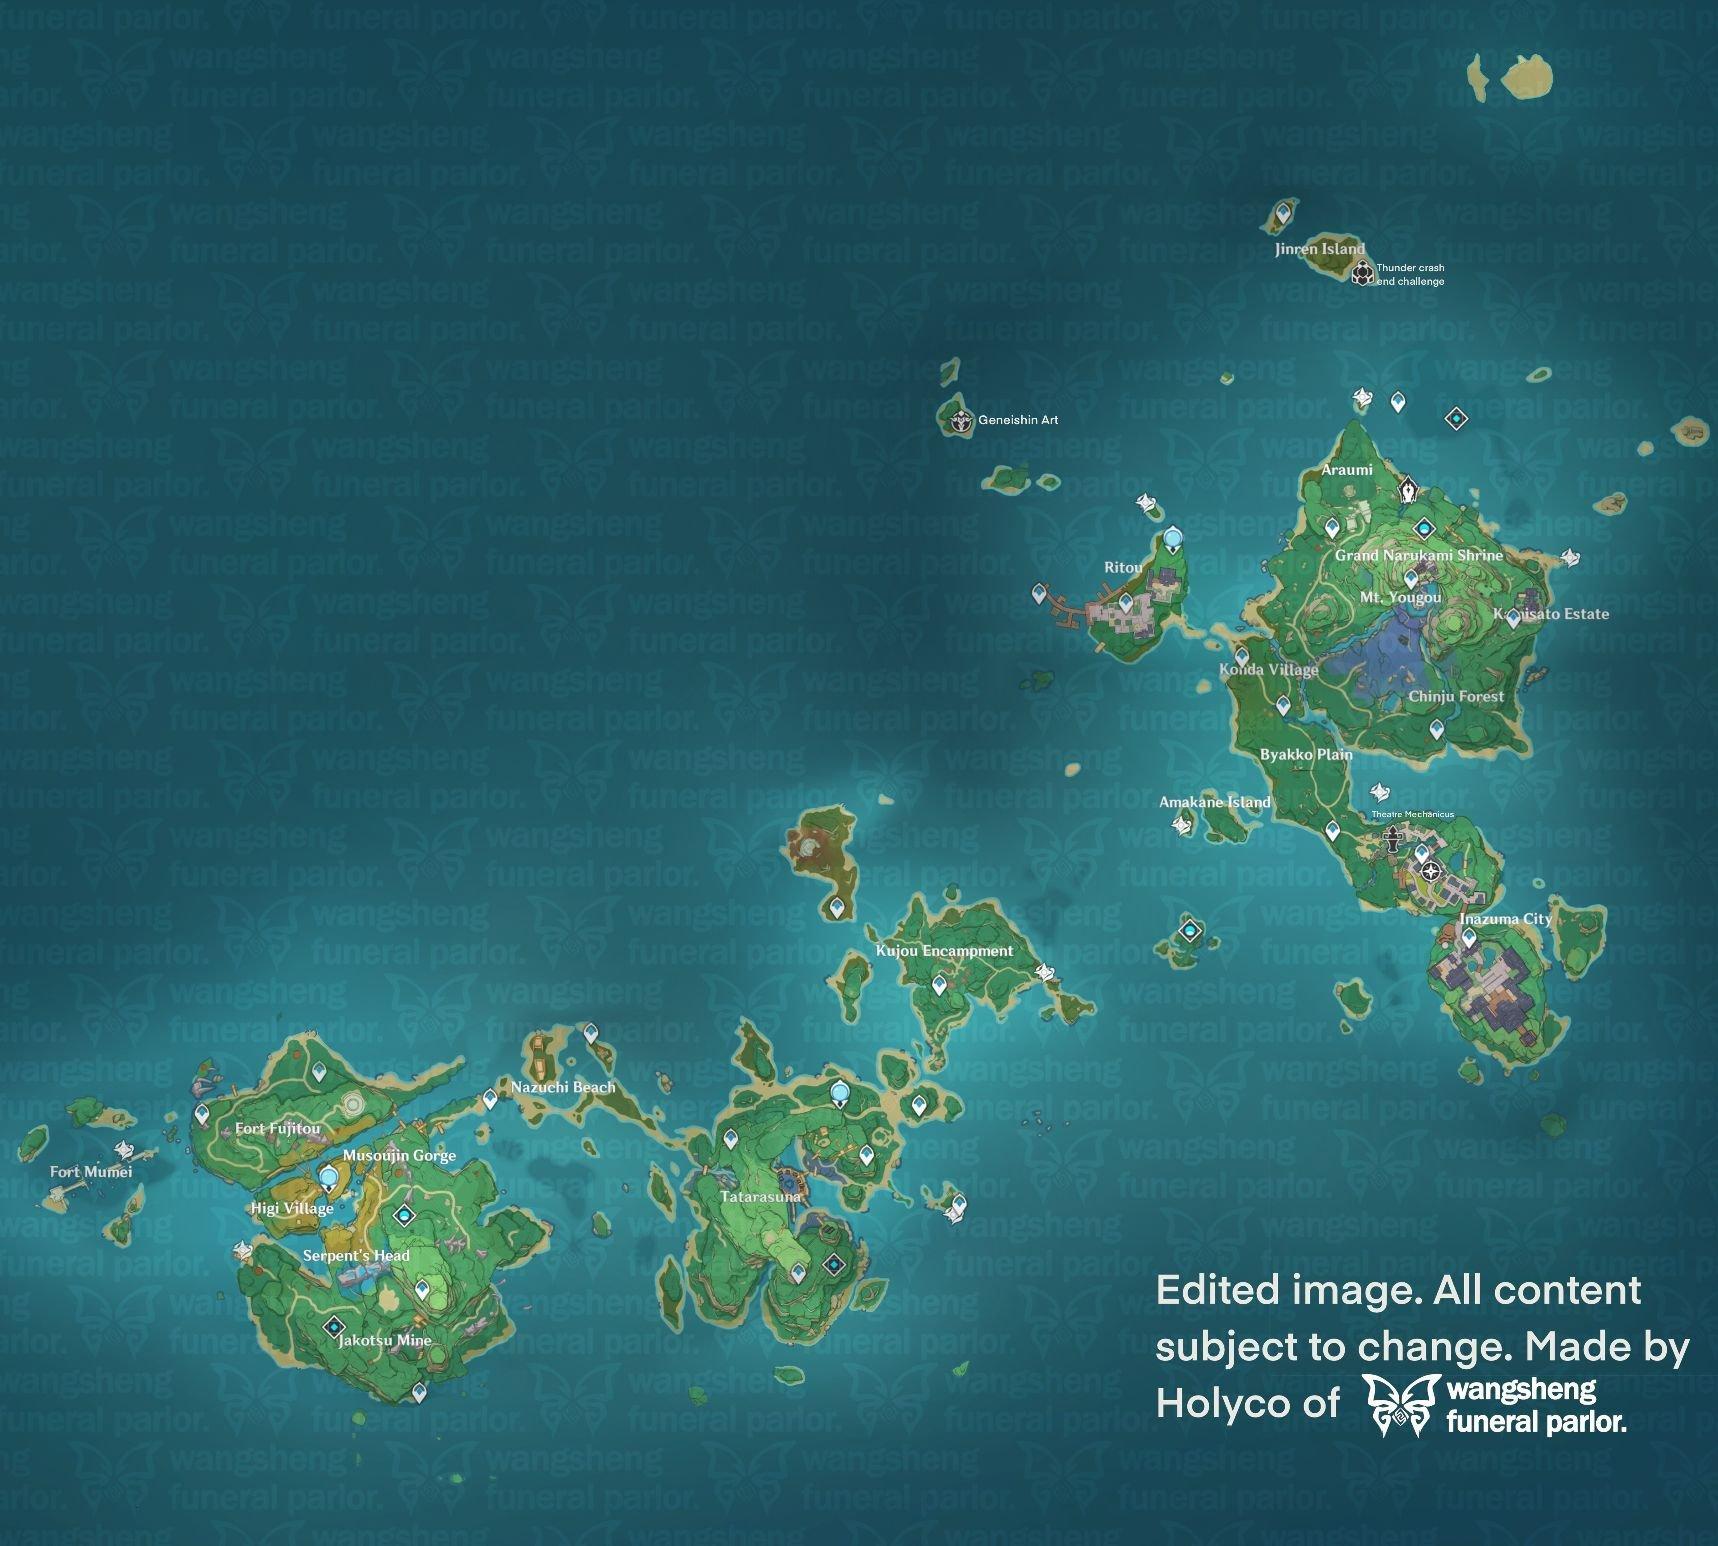 The blow was so powerful it cut yashiori island in two. Genshin Impact Leaks Fr En On Twitter Full 2 0 English Map Genshinimpact Genshin ŎŸç¥žã'¢ãƒ—デ情報 ŎŸç¥žã'¢ãƒ—デ情報 Inazuma